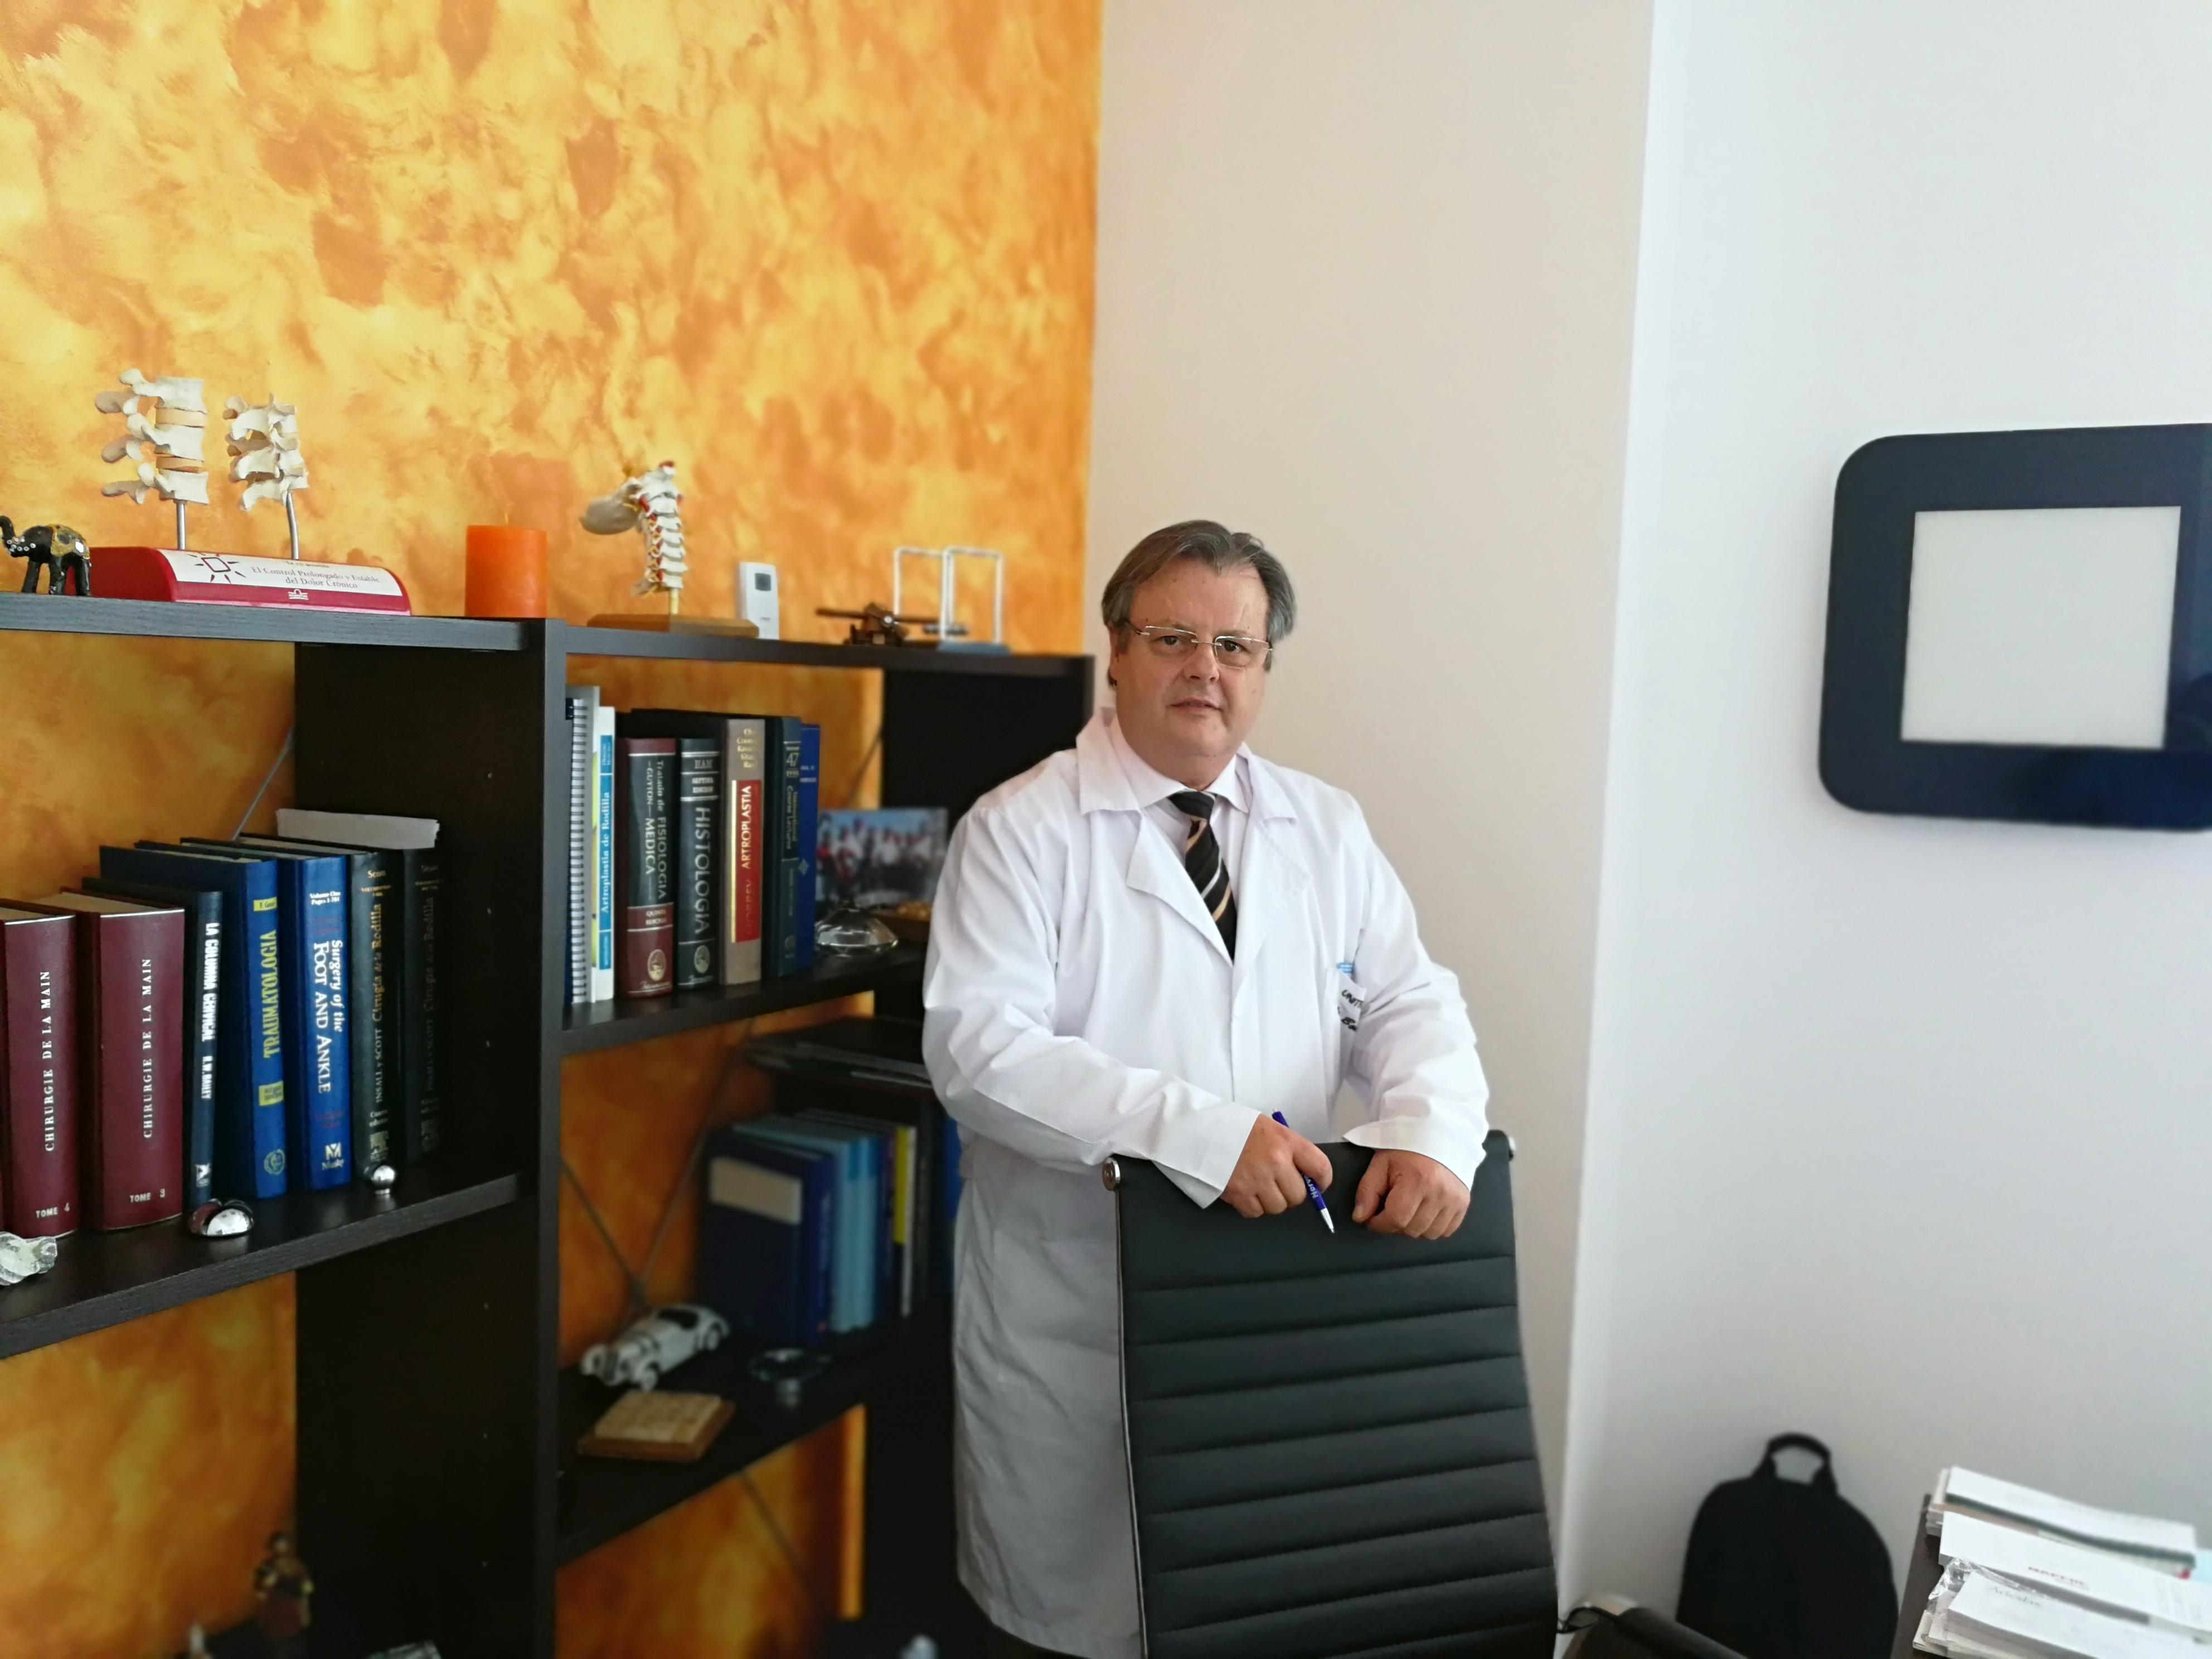 Dr Valentín Bonet